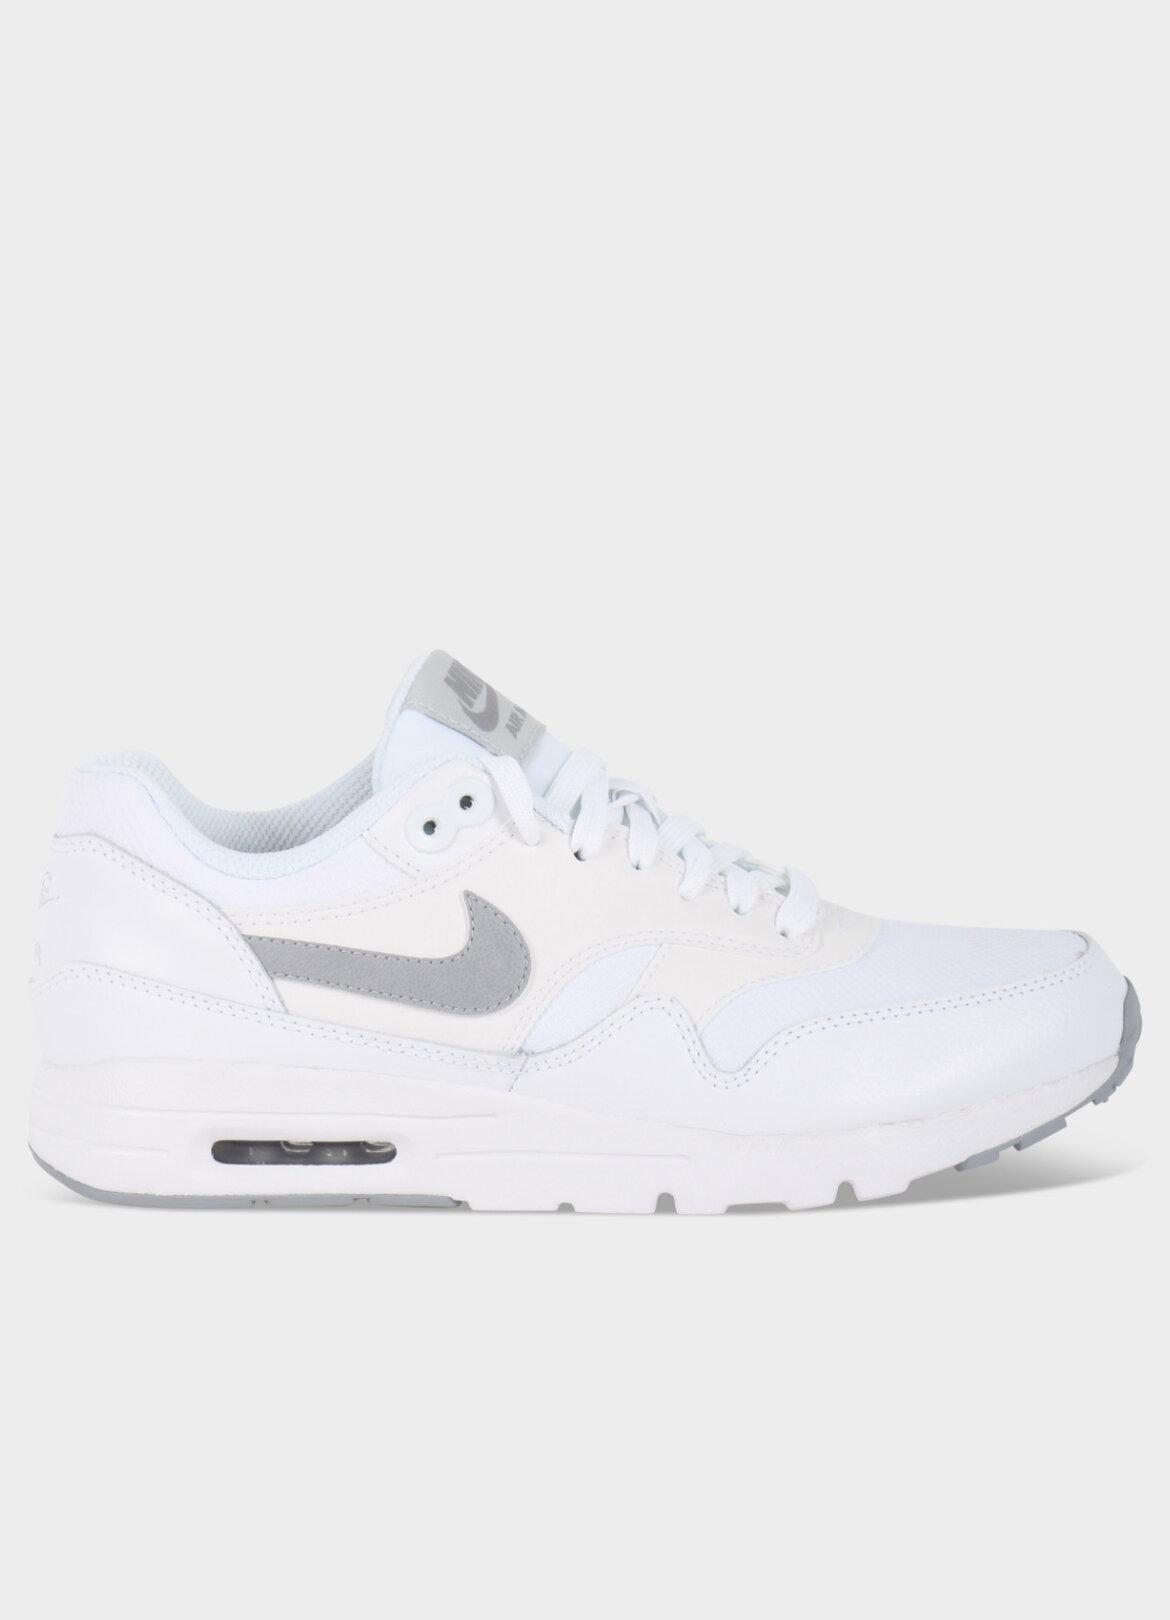 sports shoes 5f972 5ff44 ... 1 ultra essentials black black wolf grey metallic silver 1ed7c e51f4   new arrivals nike nike air max ultra essentials 5da9b f16d3